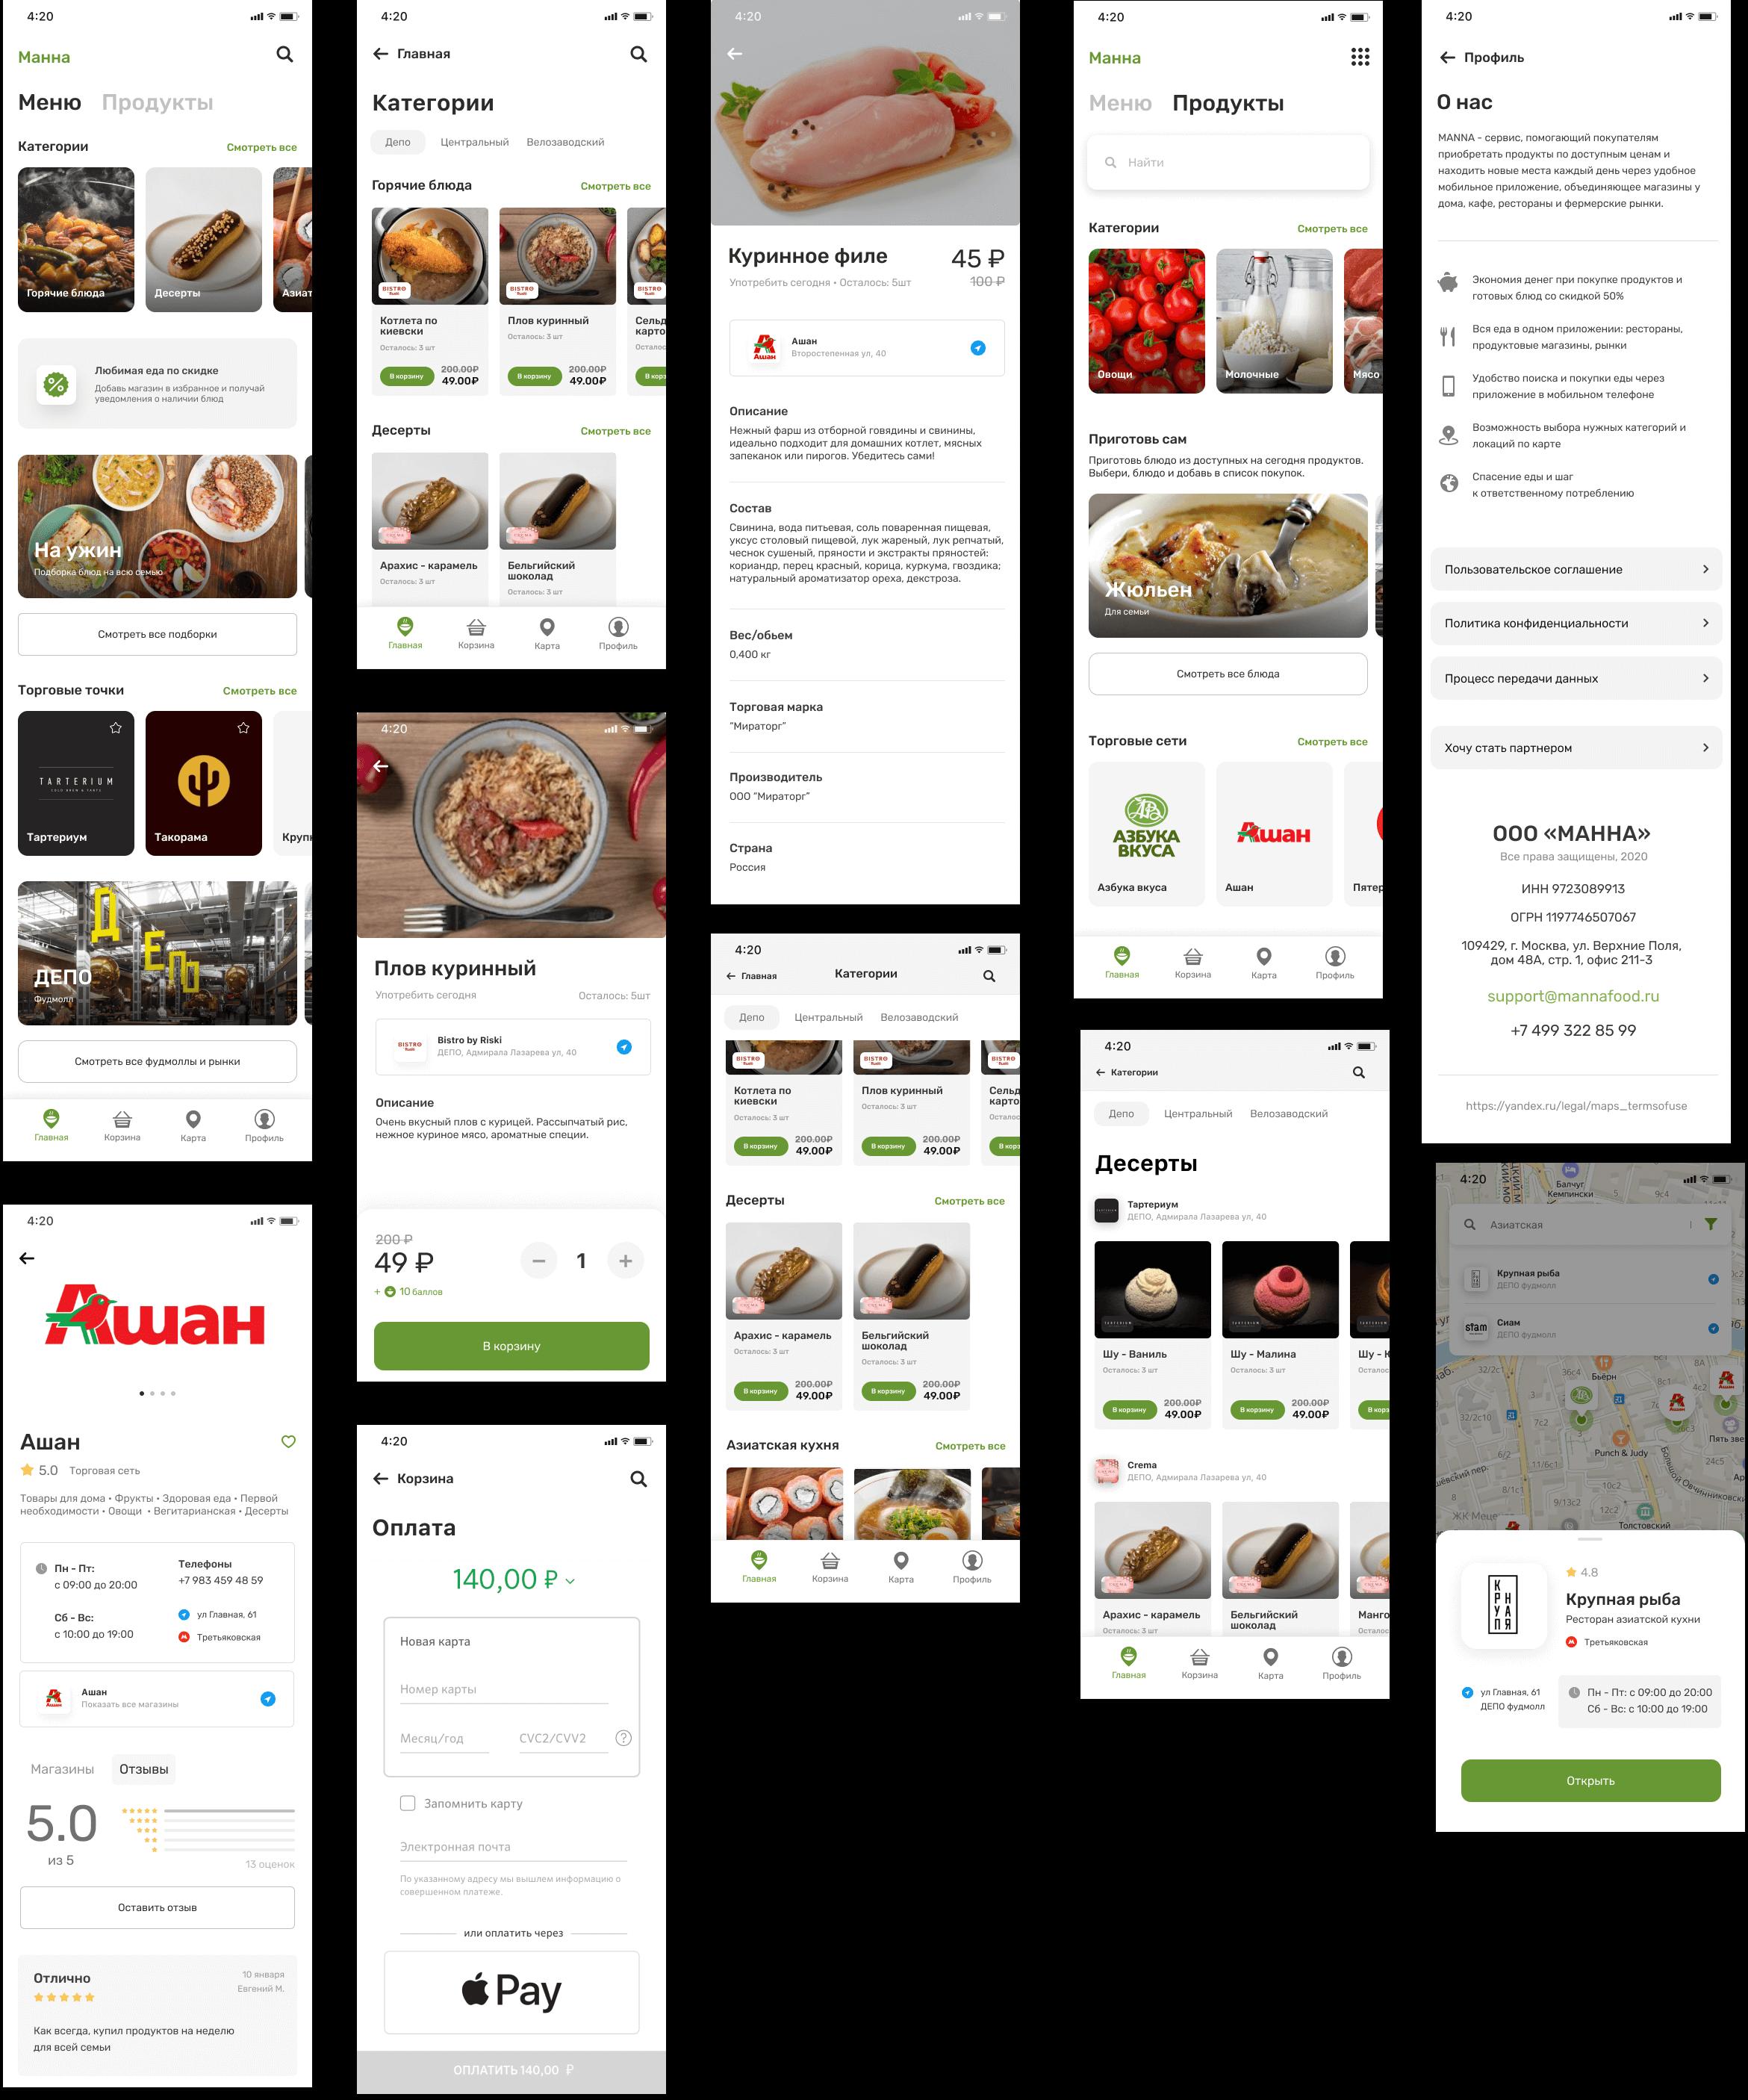 manna pages design